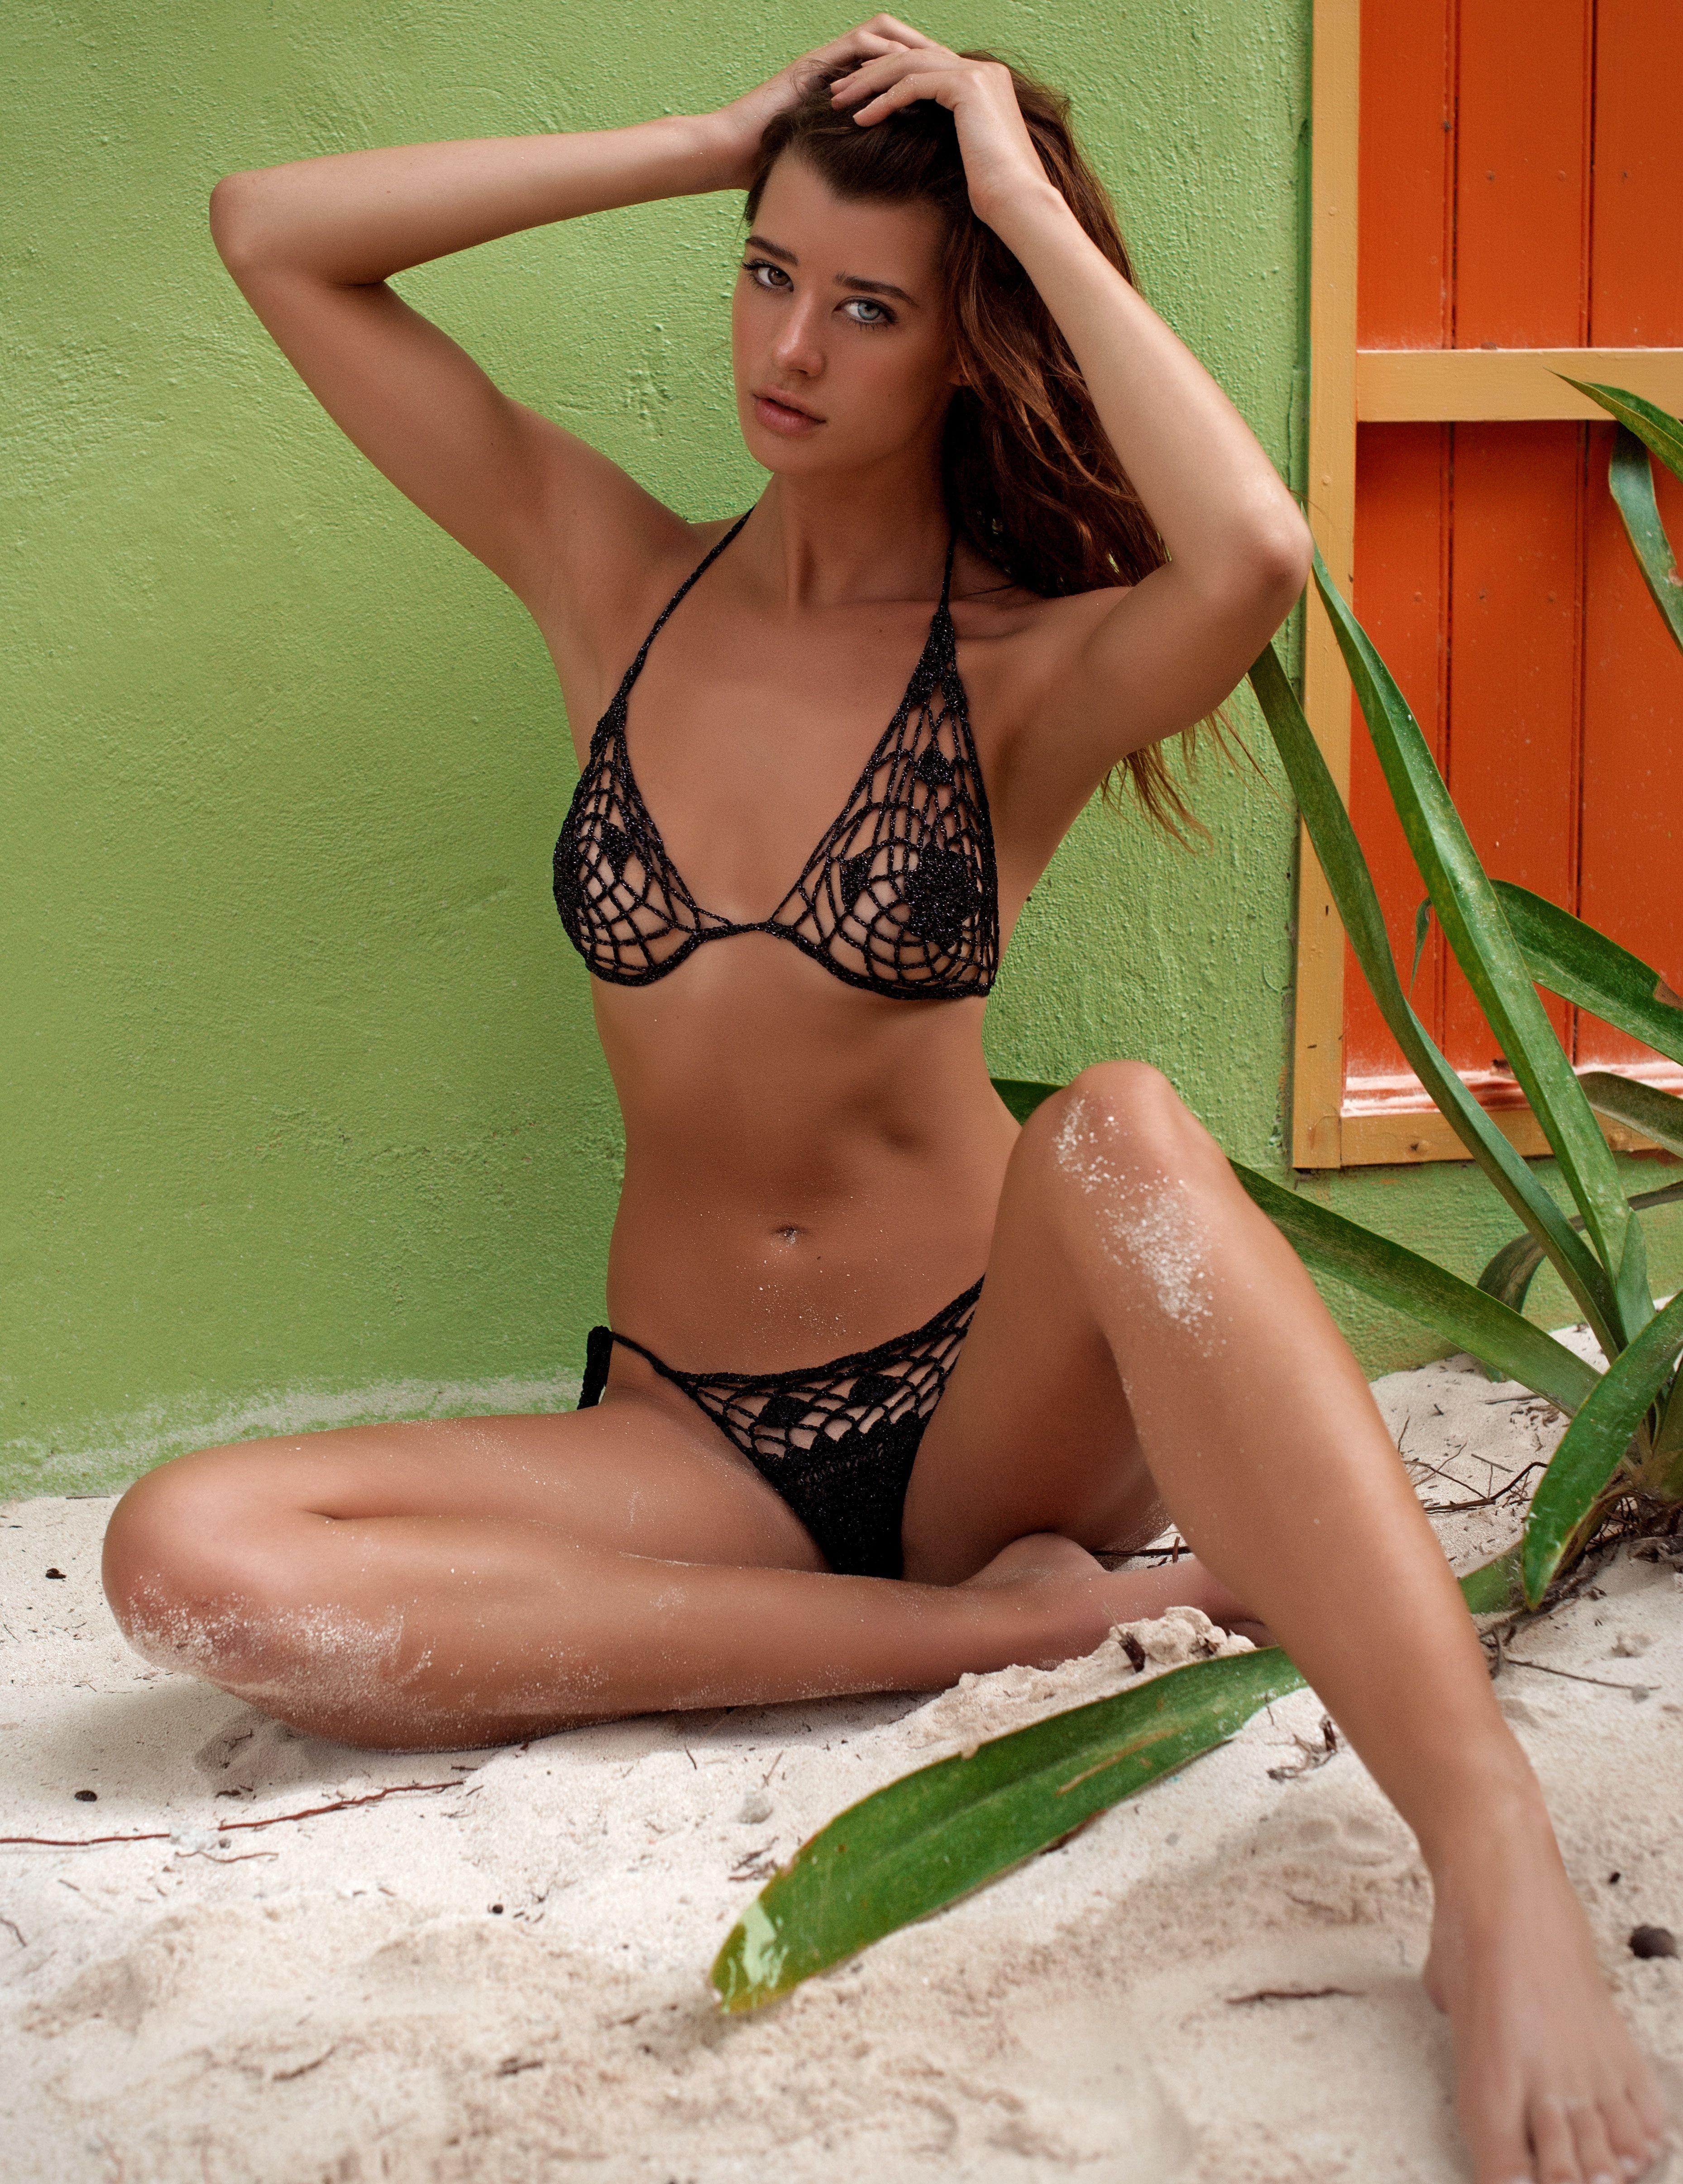 Model sexy pic